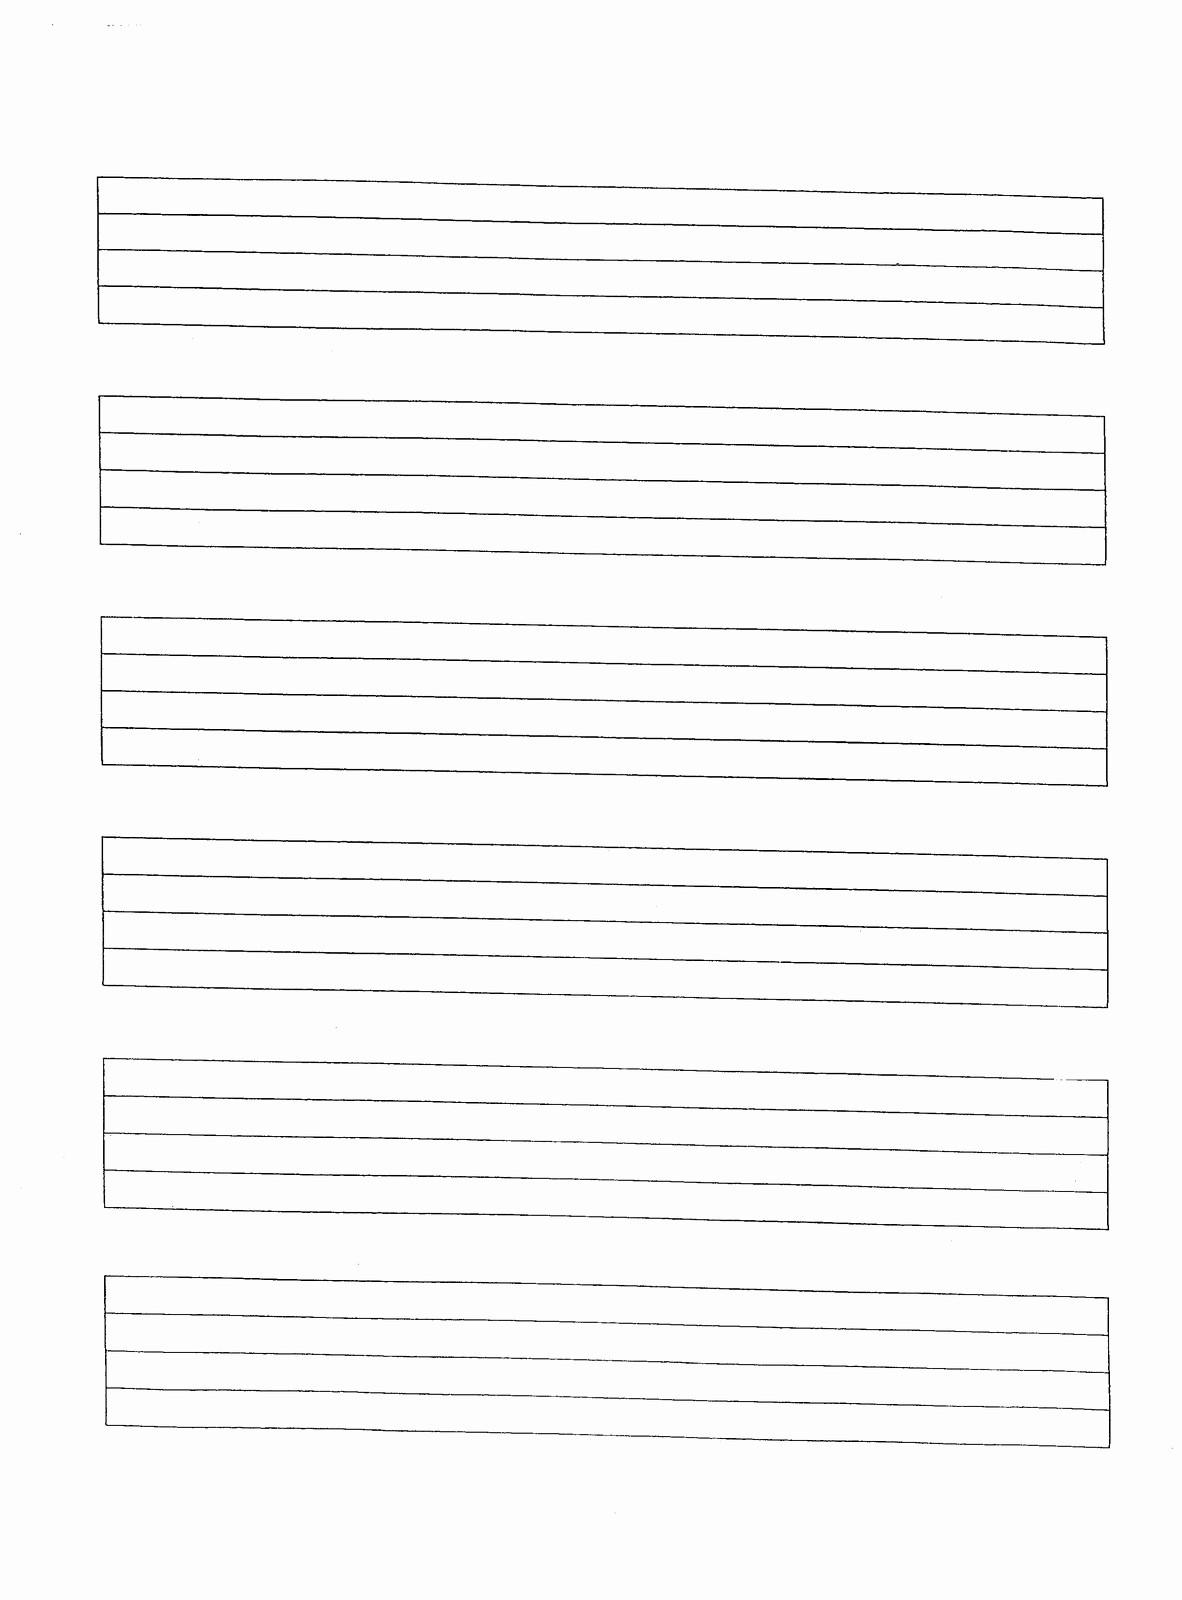 12 Stave Manuscript Paper Pdf New Free Music Manuscript Paper Baskanai